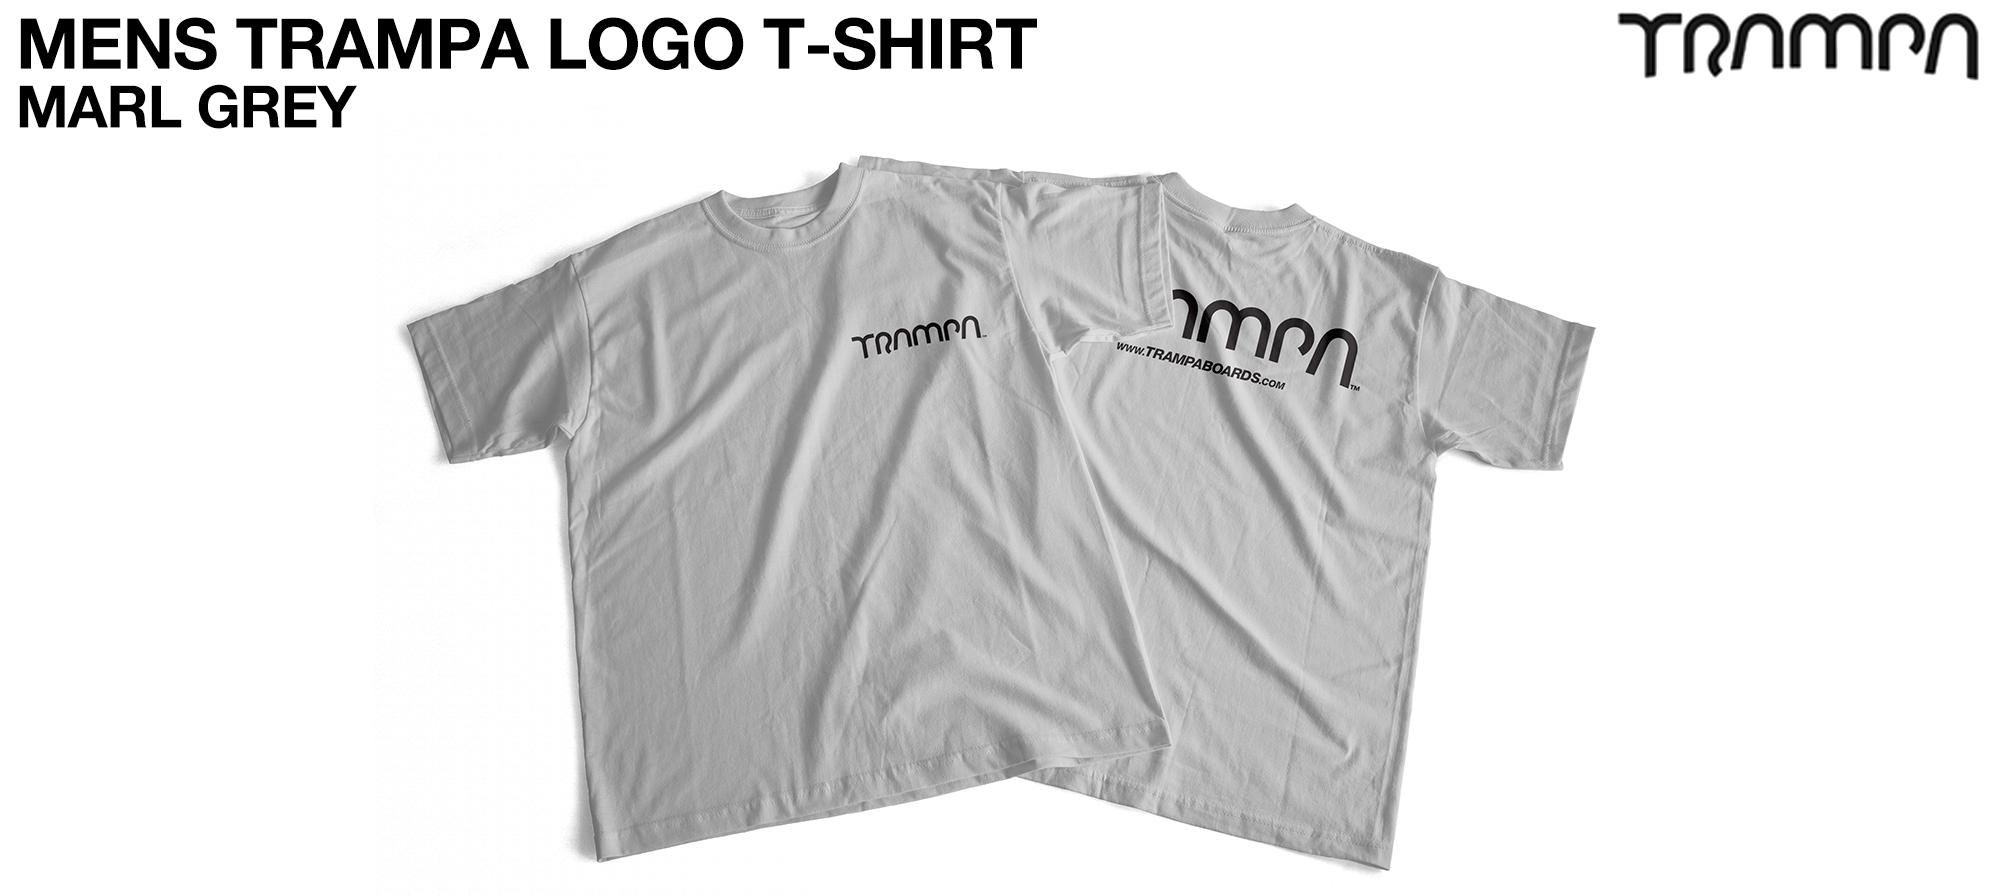 Gildan T Shirt Marl Grey with Black Logo  (COPY)